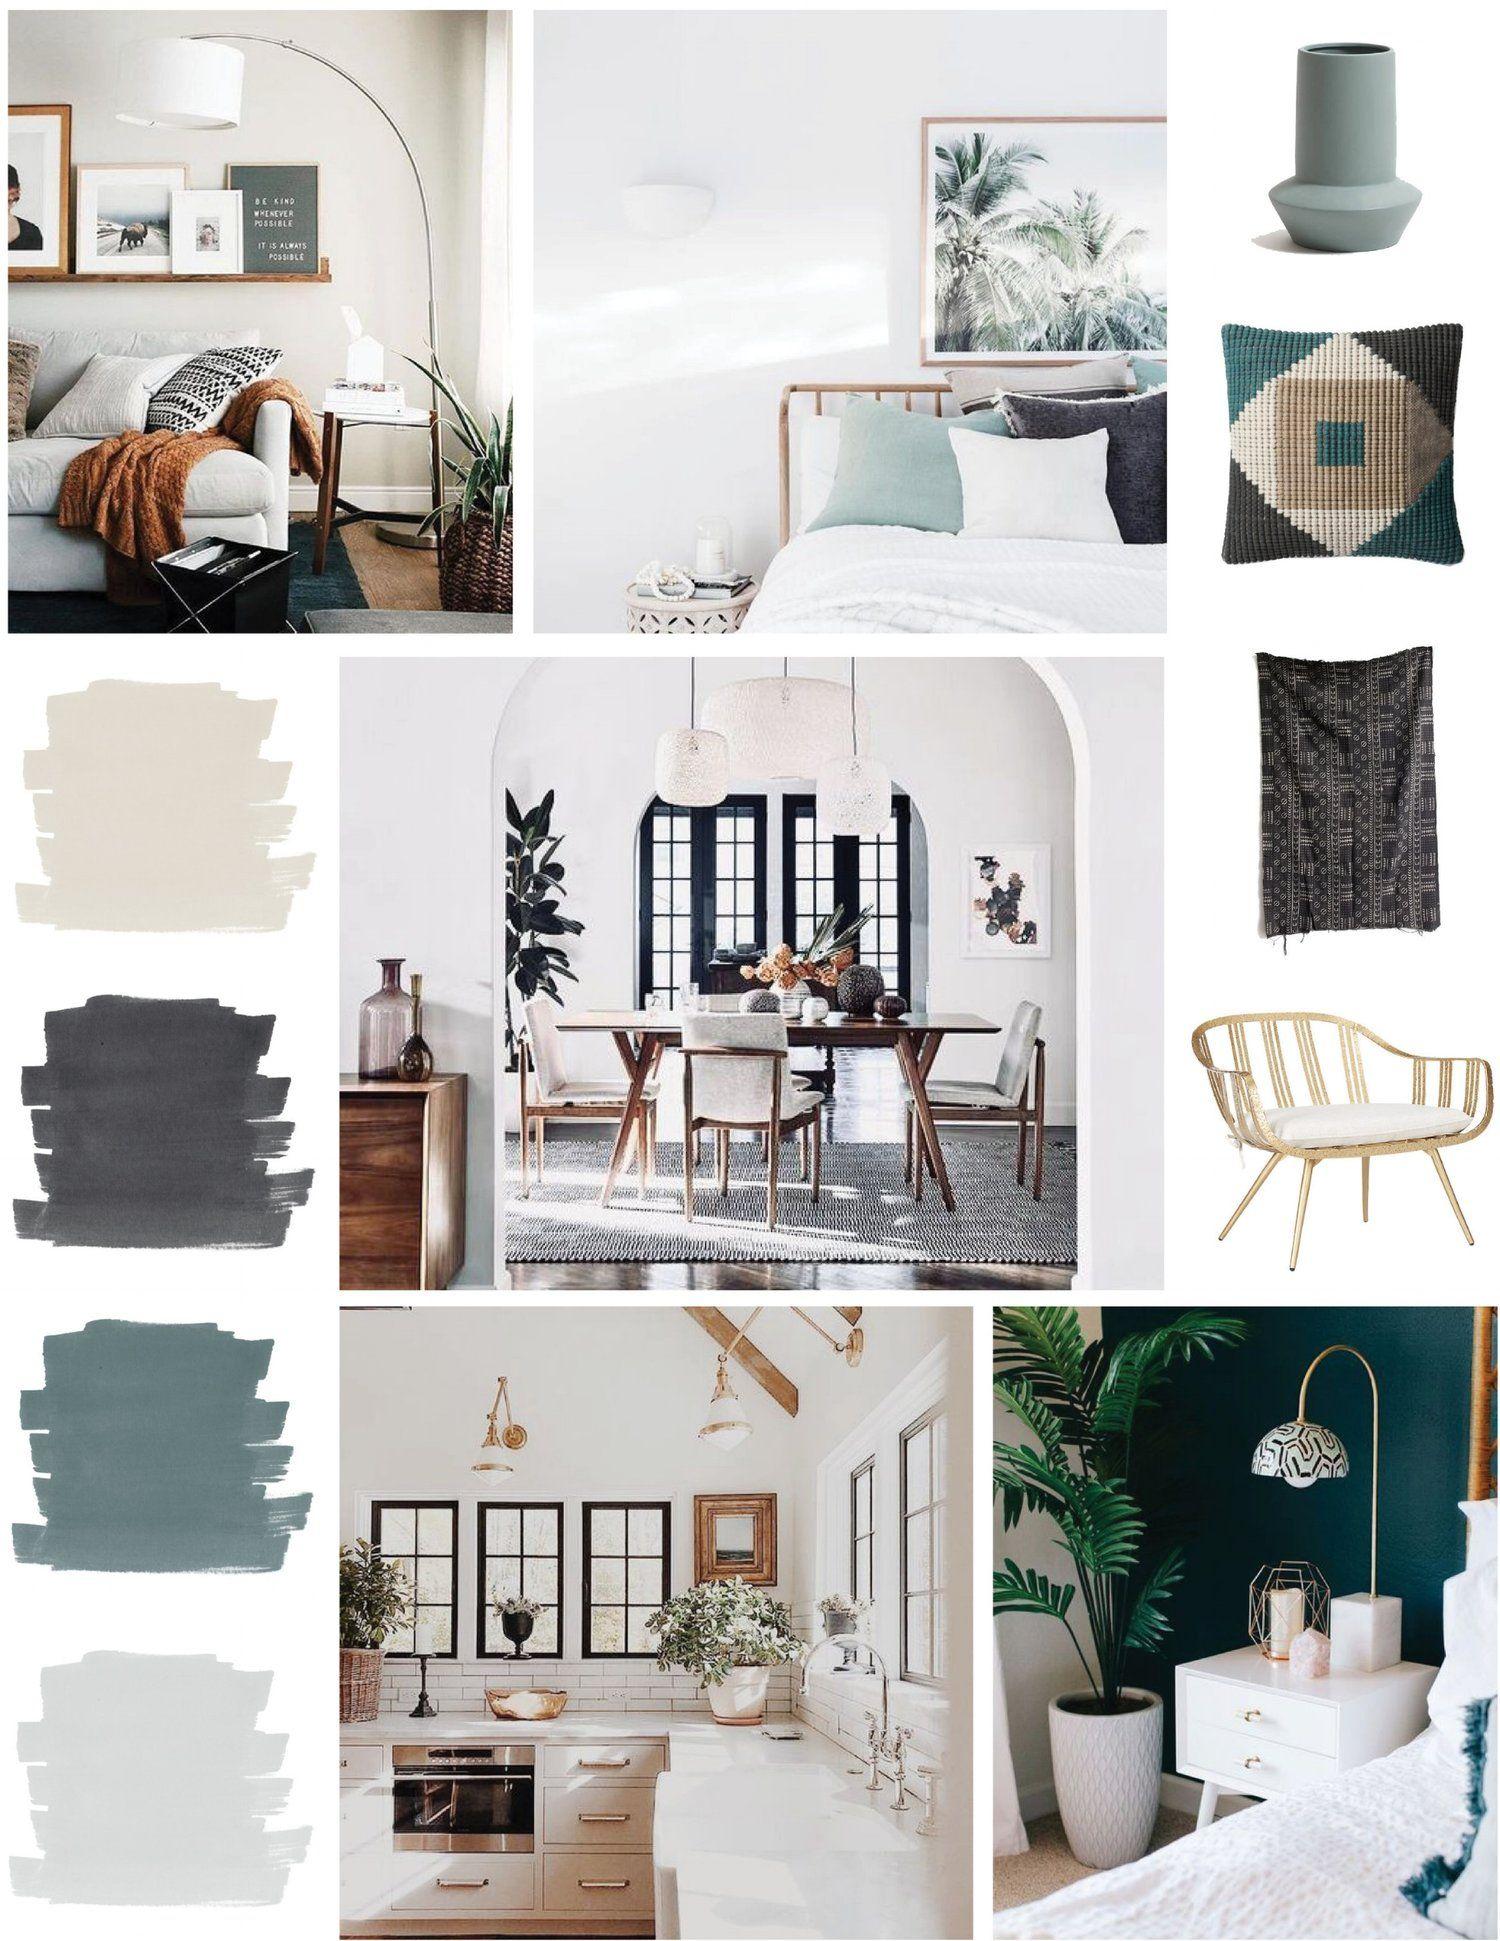 Nyla Free Designs Inc Inspired By Maui Interior Design